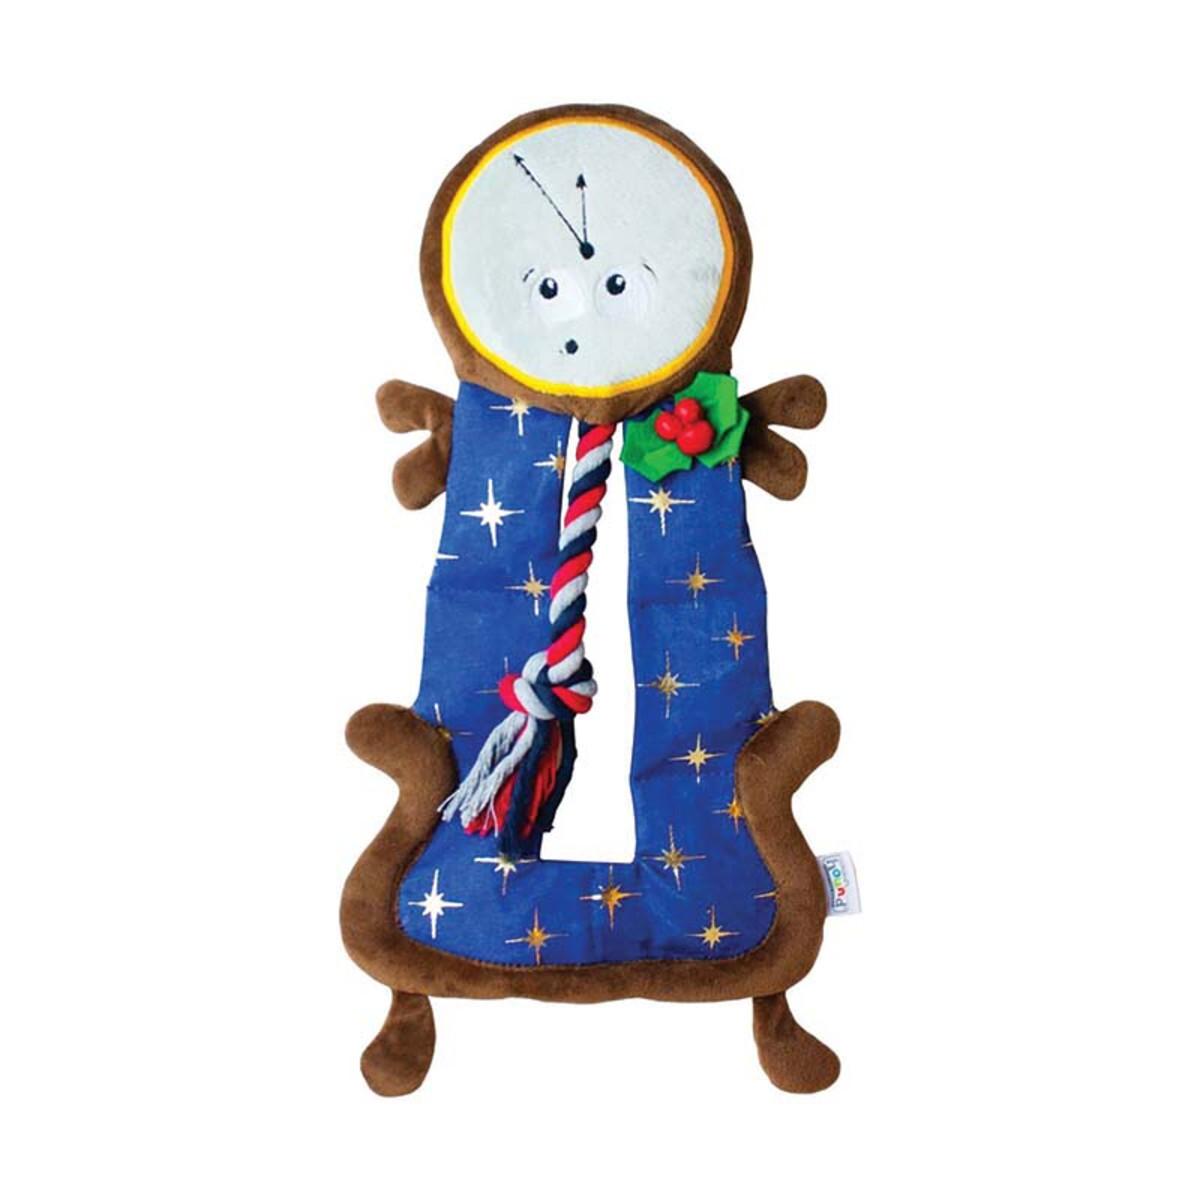 Outward Hound Squeaker Matz Clock Tower Dog Toy at Ryan's Pet Supplies